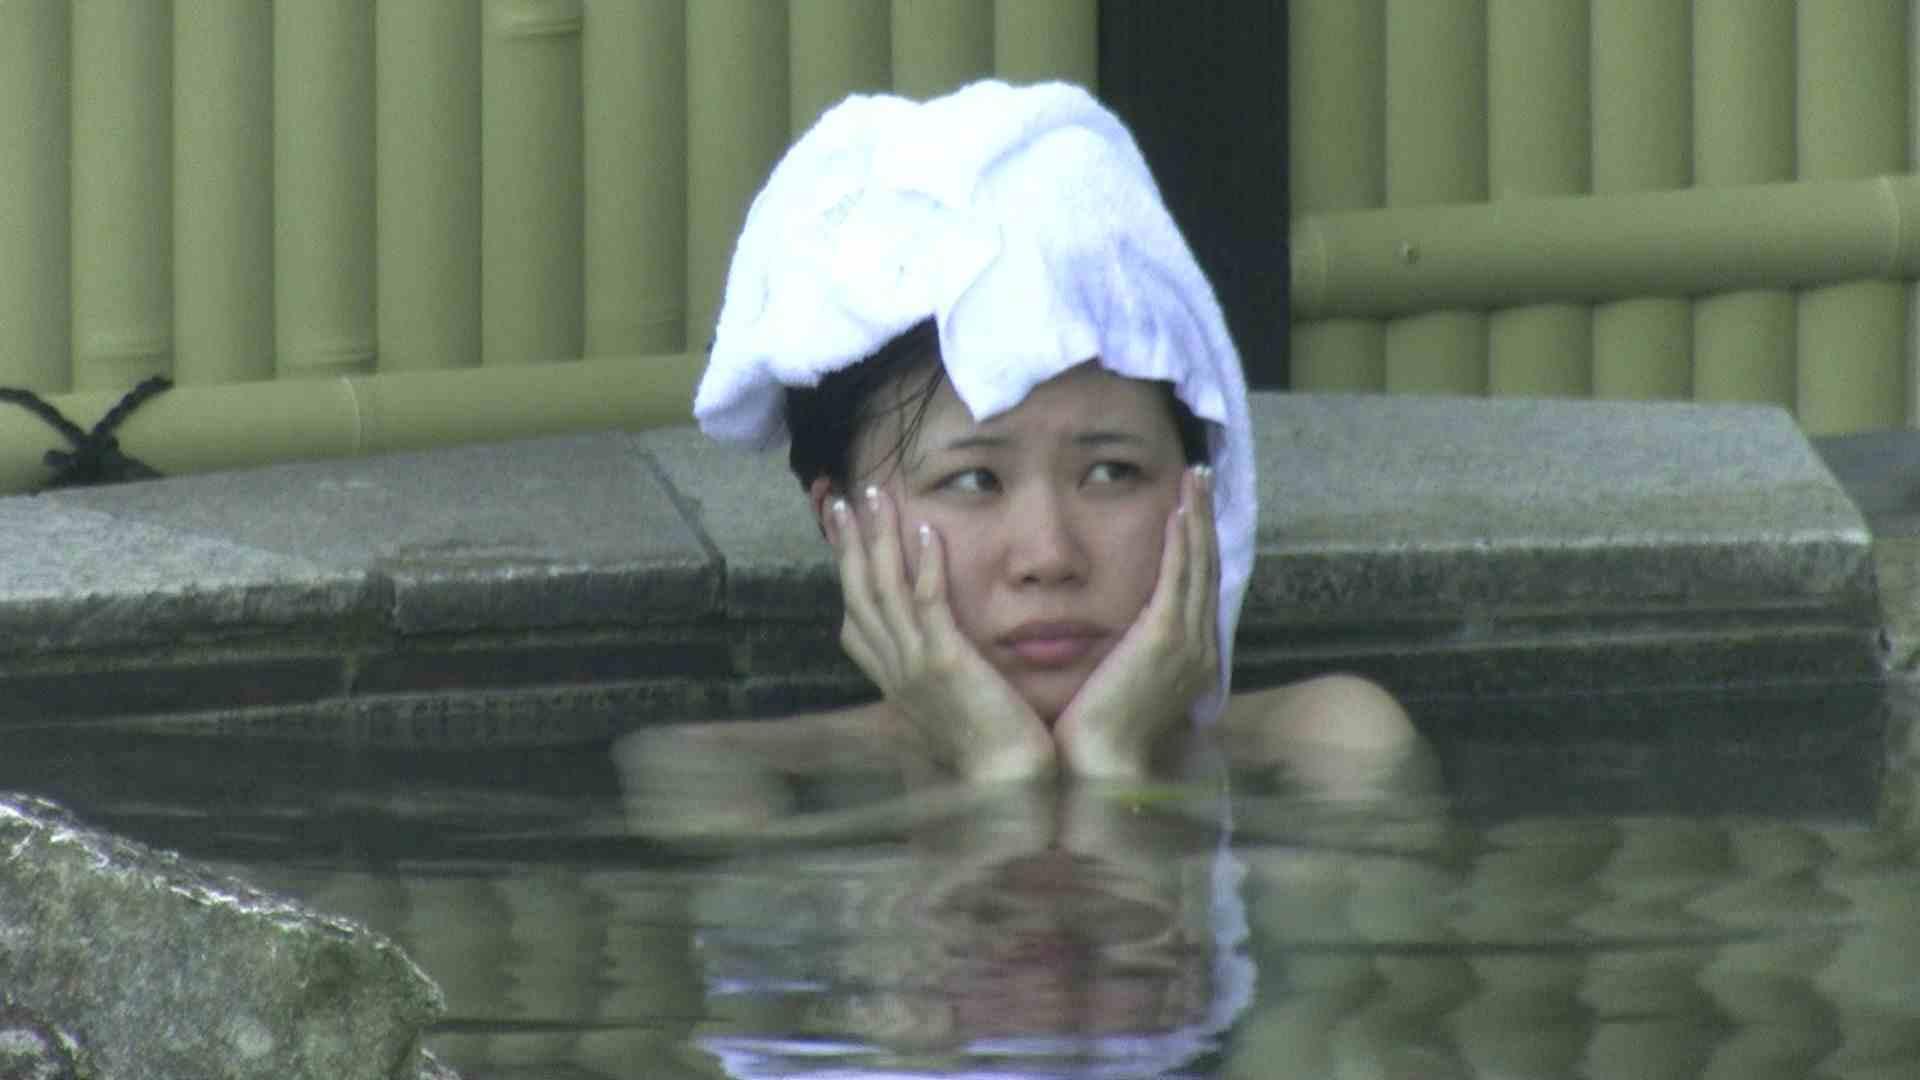 Aquaな露天風呂Vol.183 盗撮 | OLセックス  69画像 61